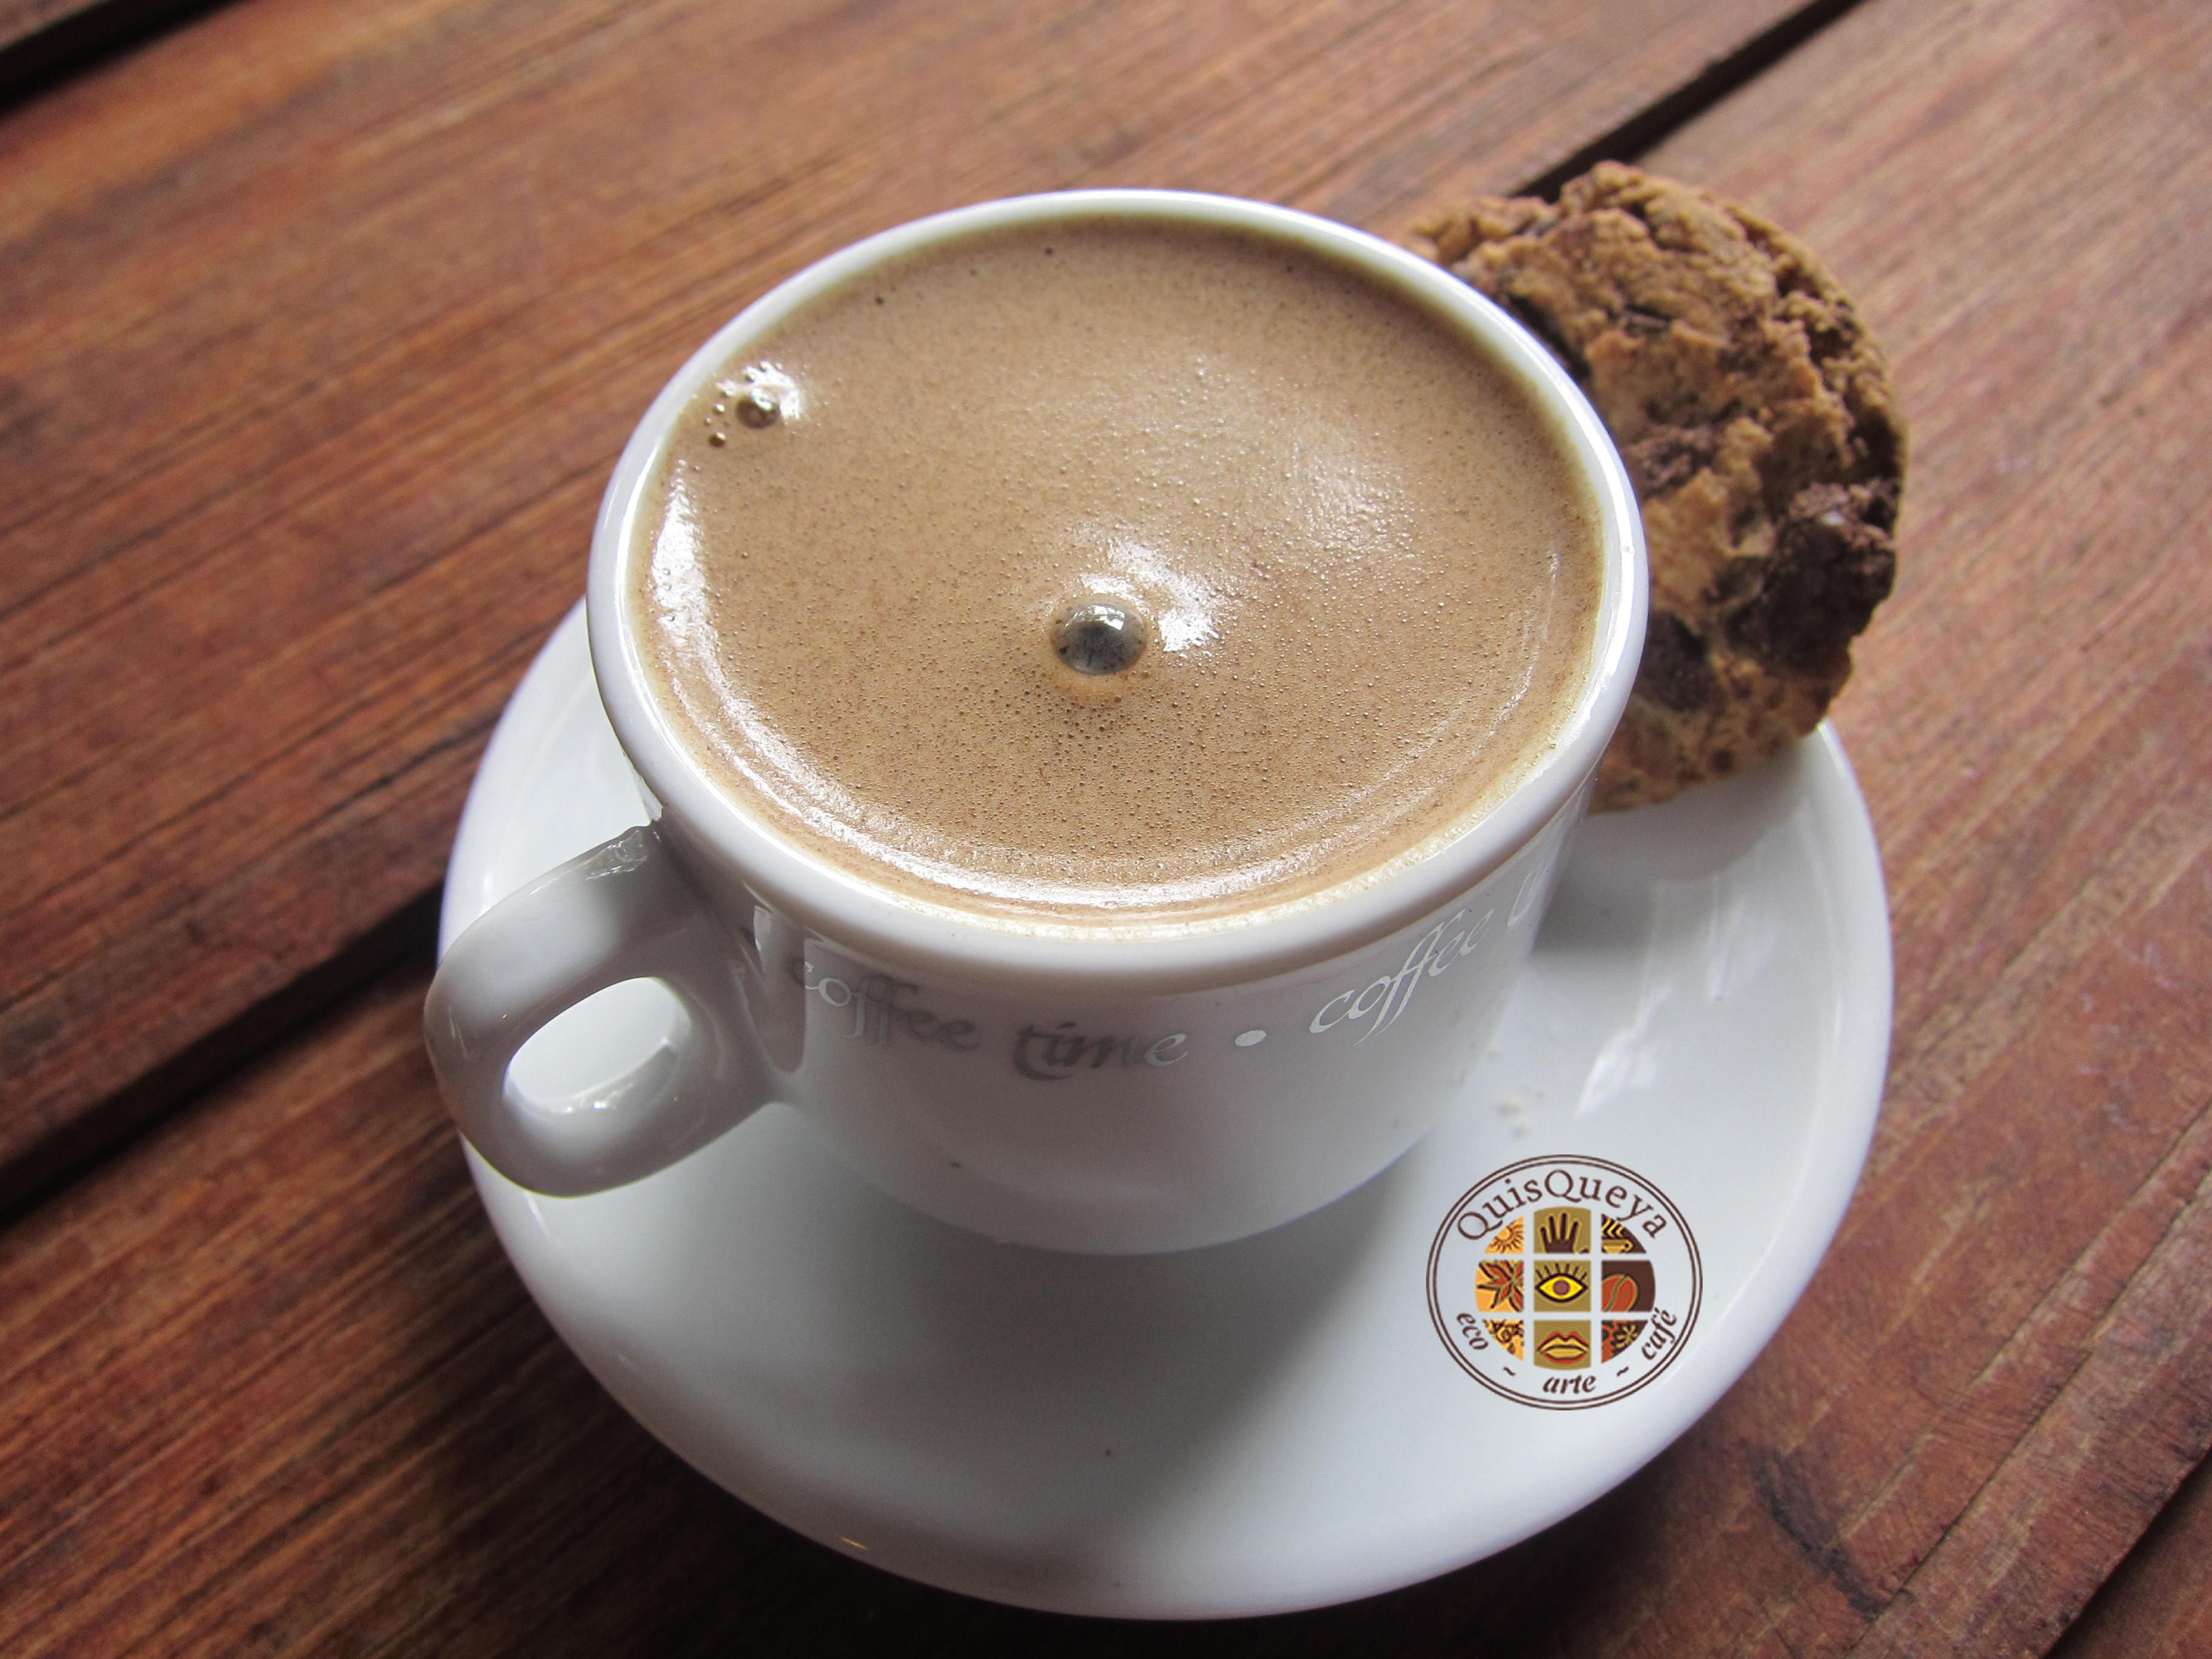 ¿Qué tal un café?